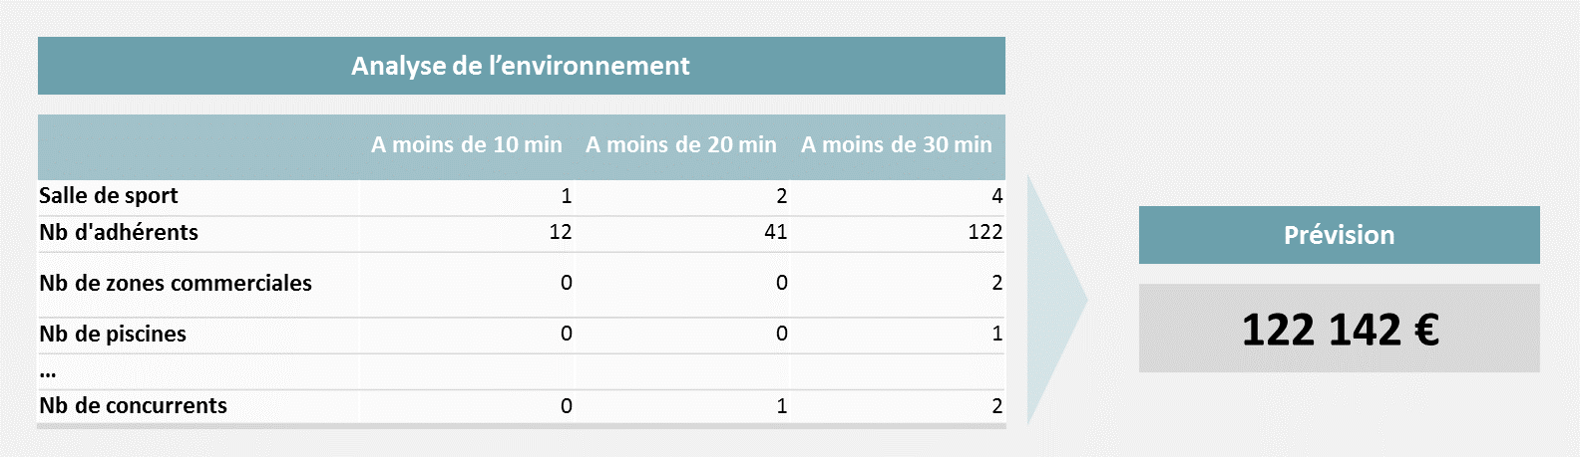 Analyse_Environnement